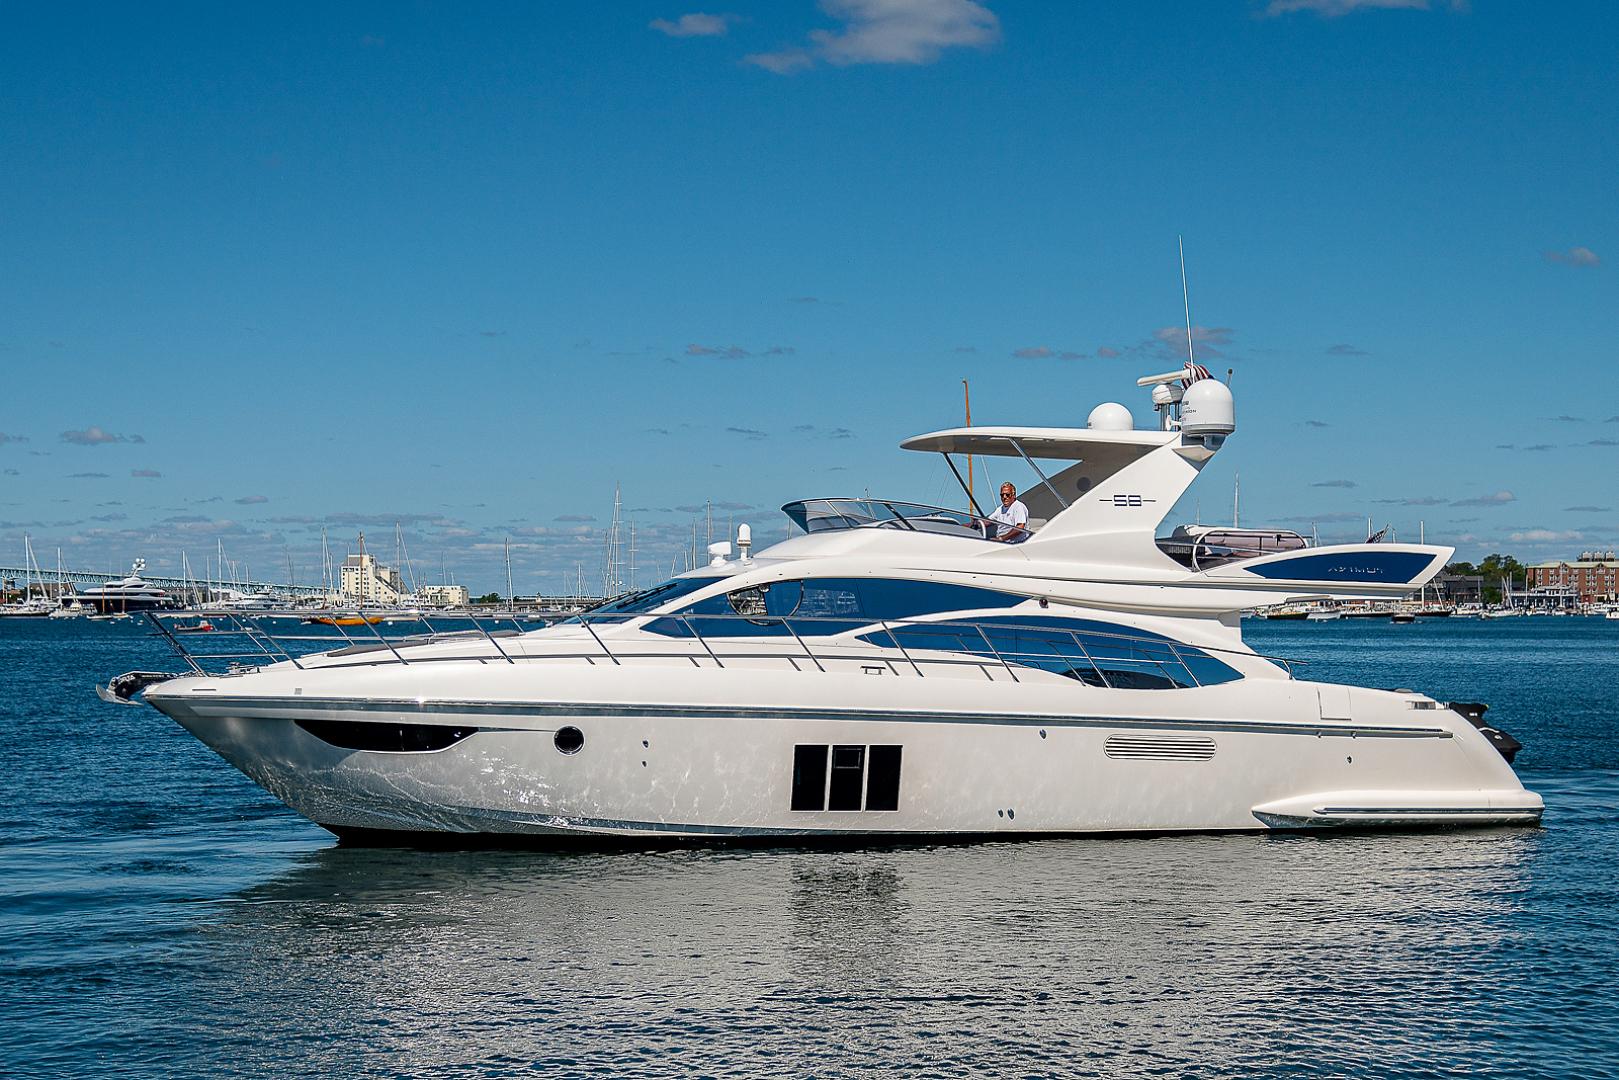 Azimut-58 Fly Motor Yacht 2011-Nova Fort Lauderdale-Florida-United States-58_azimut_nova__profiles10-1490550 | Thumbnail